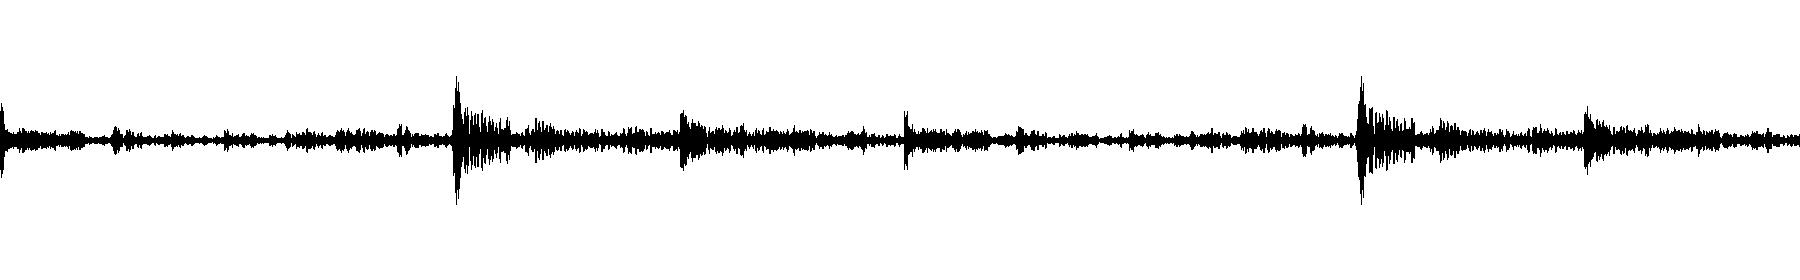 blbc cinedrumsb 130 02